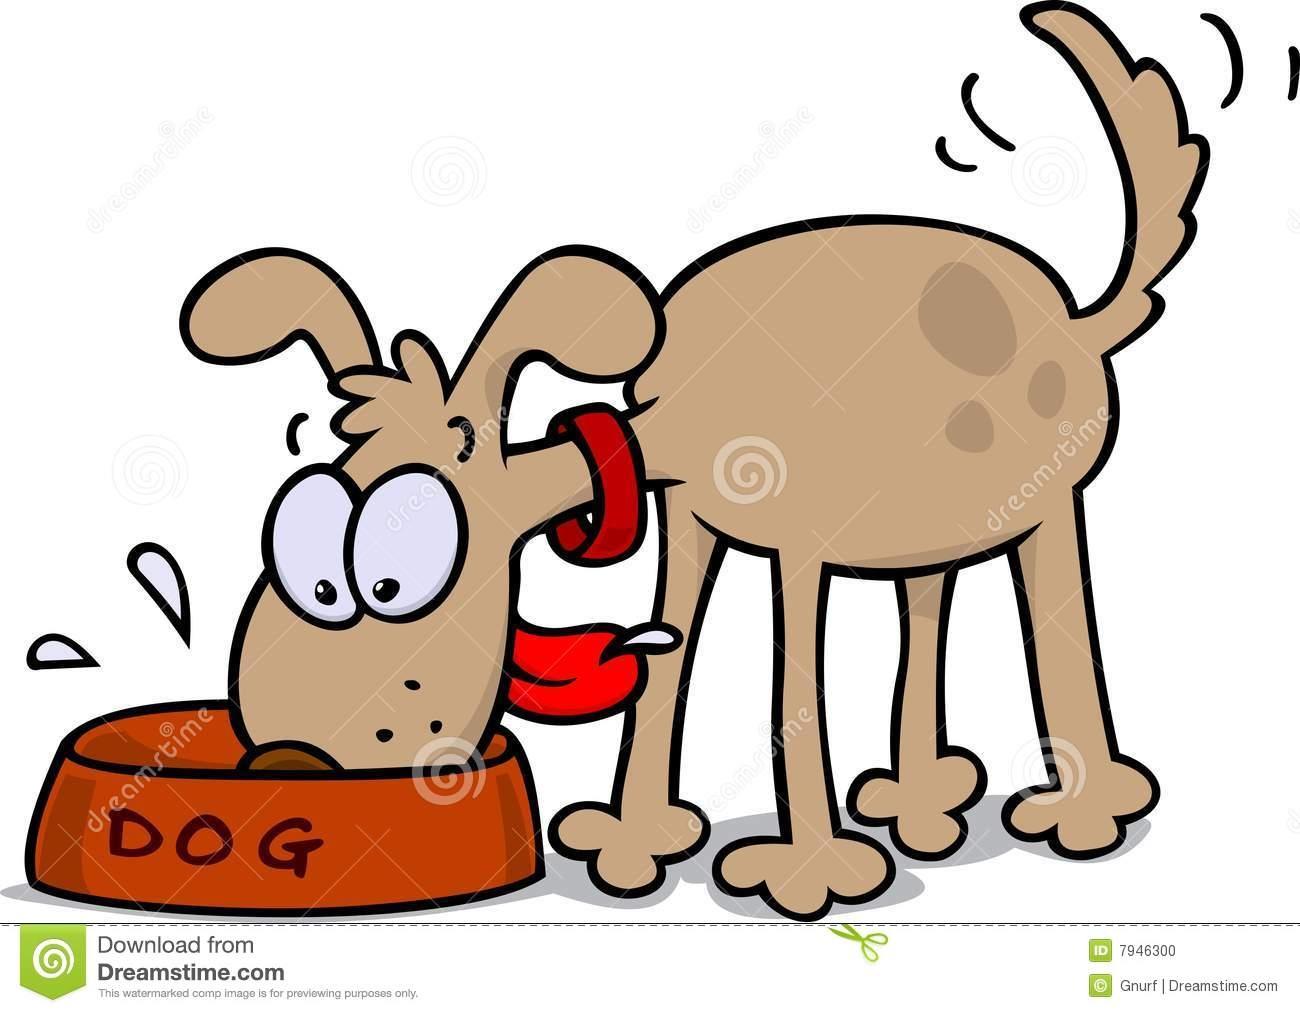 1300x1013 Homework Clipart Dog Eats